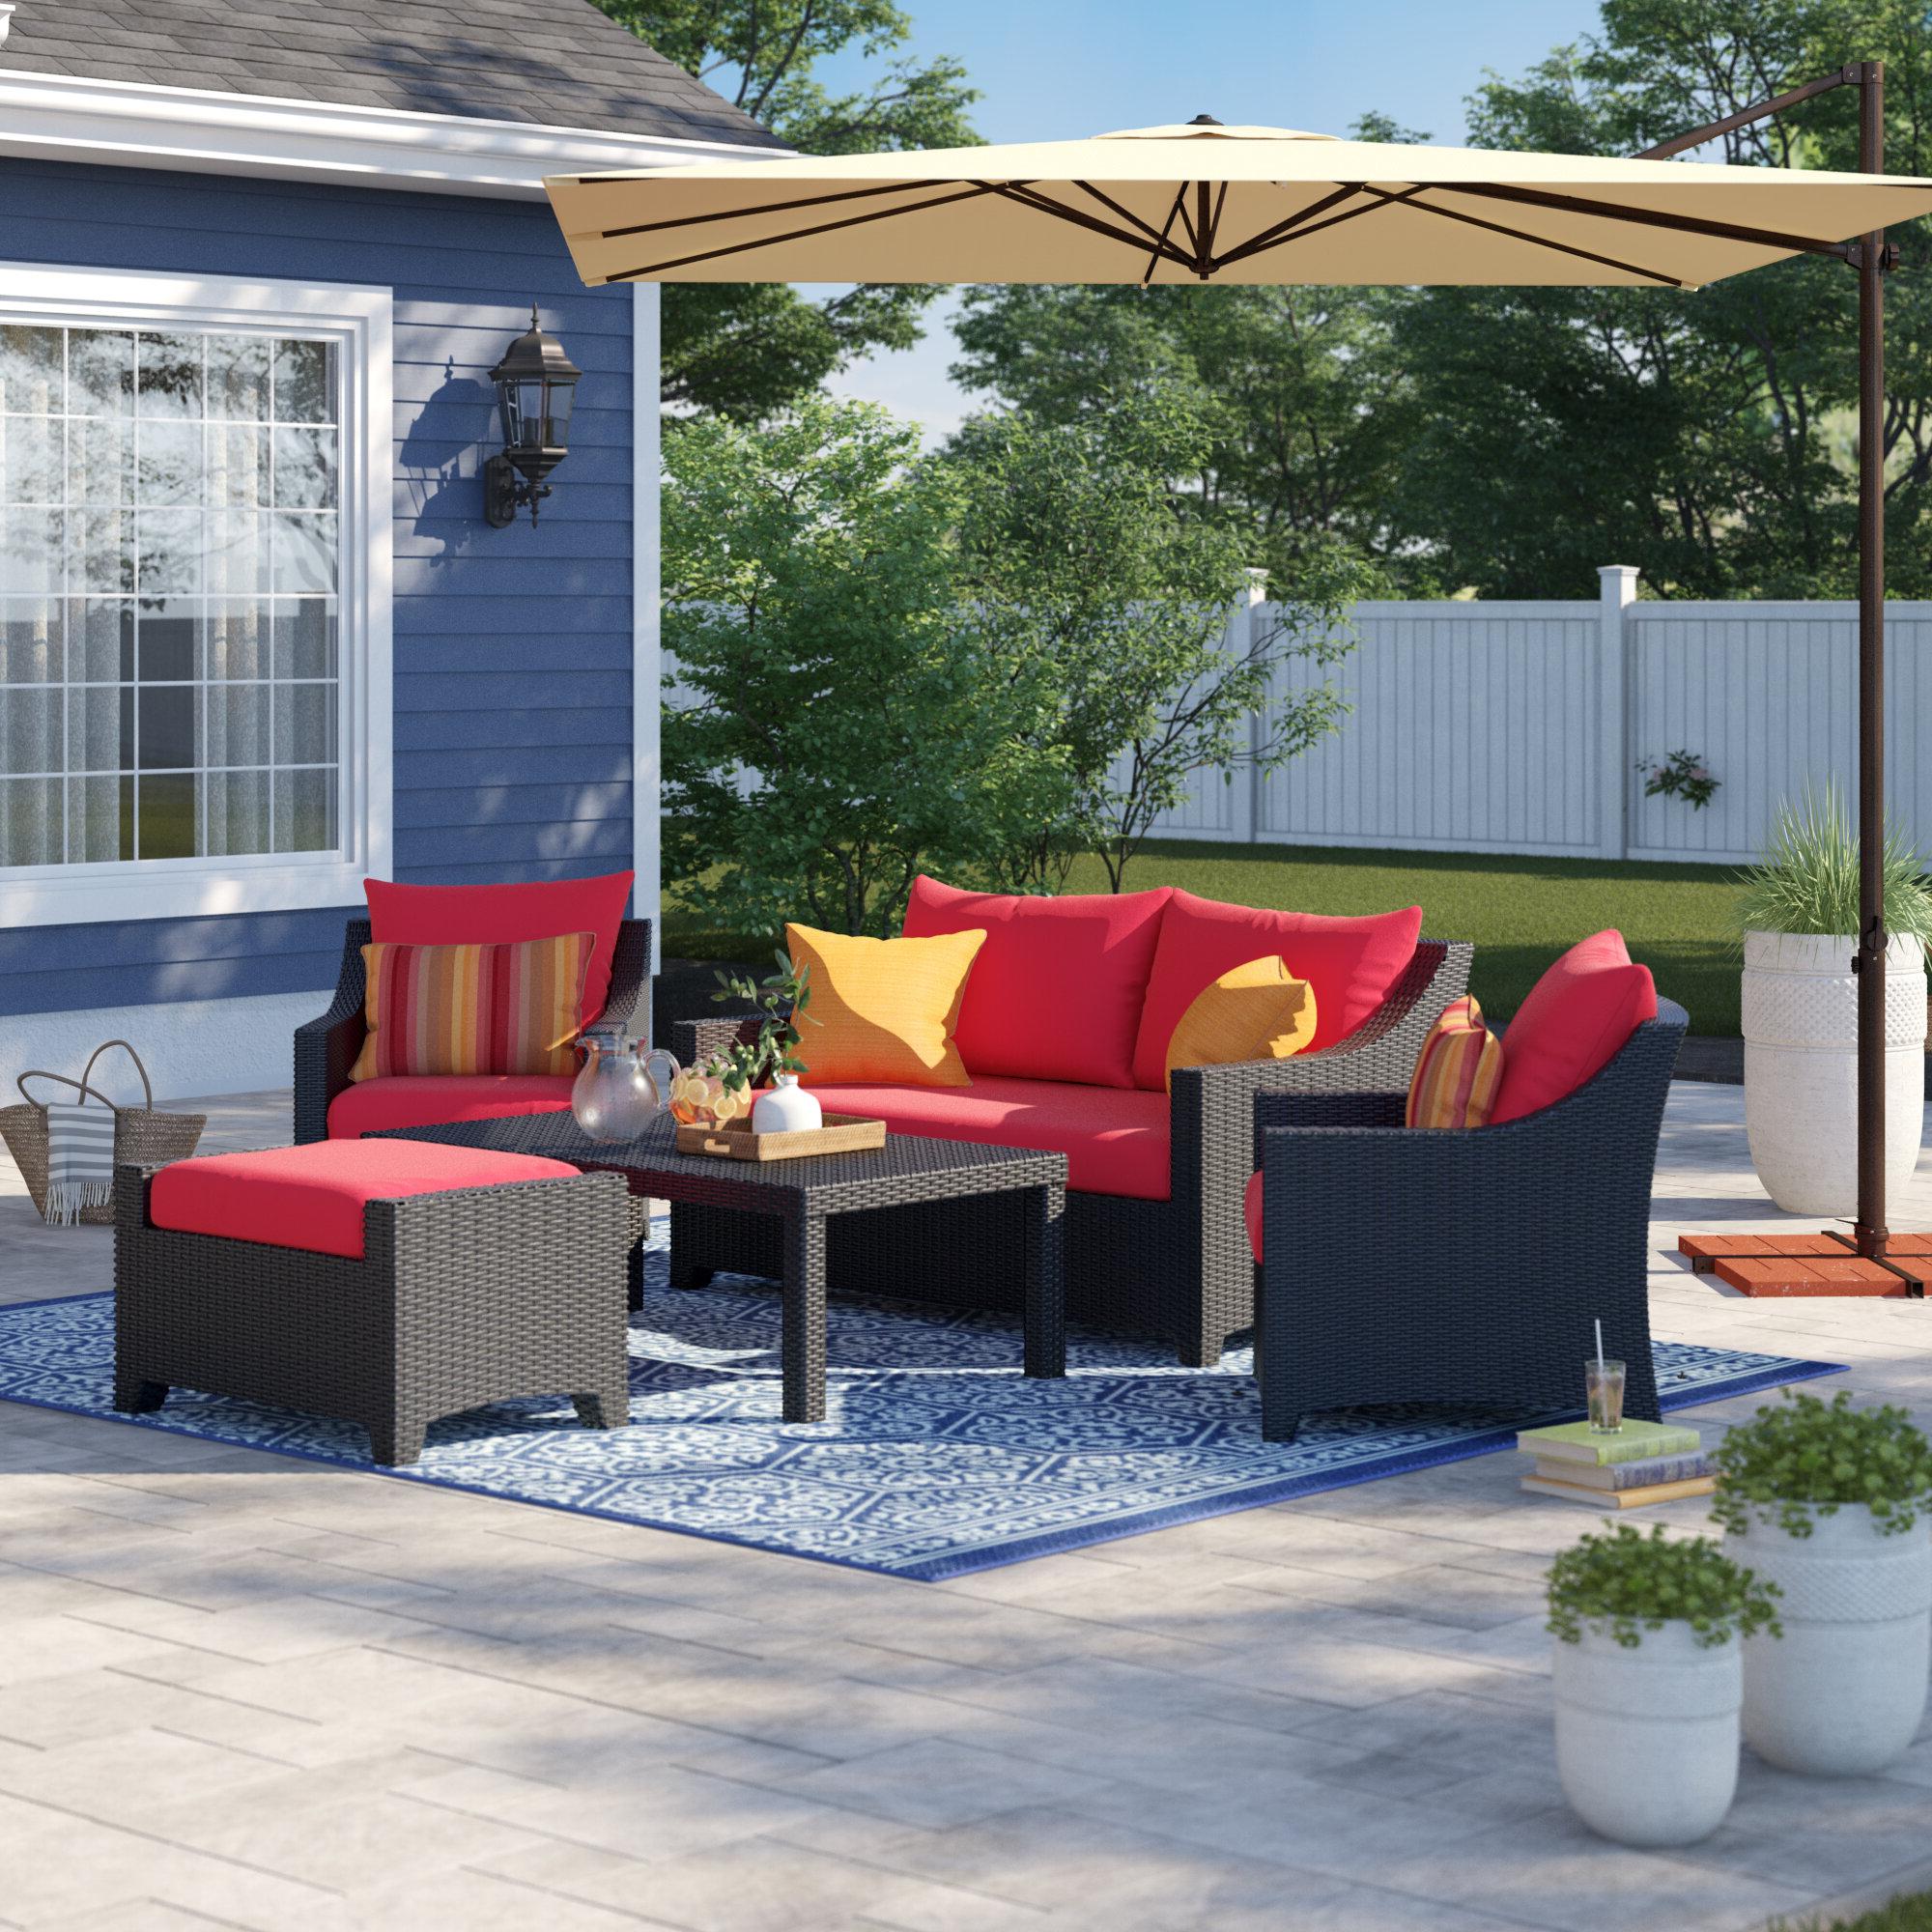 Northridge Patio Sofas With Sunbrella Cushions Within 2019 Northridge 5 Piece Sunbrella Sofa Set With Cushions (View 12 of 20)